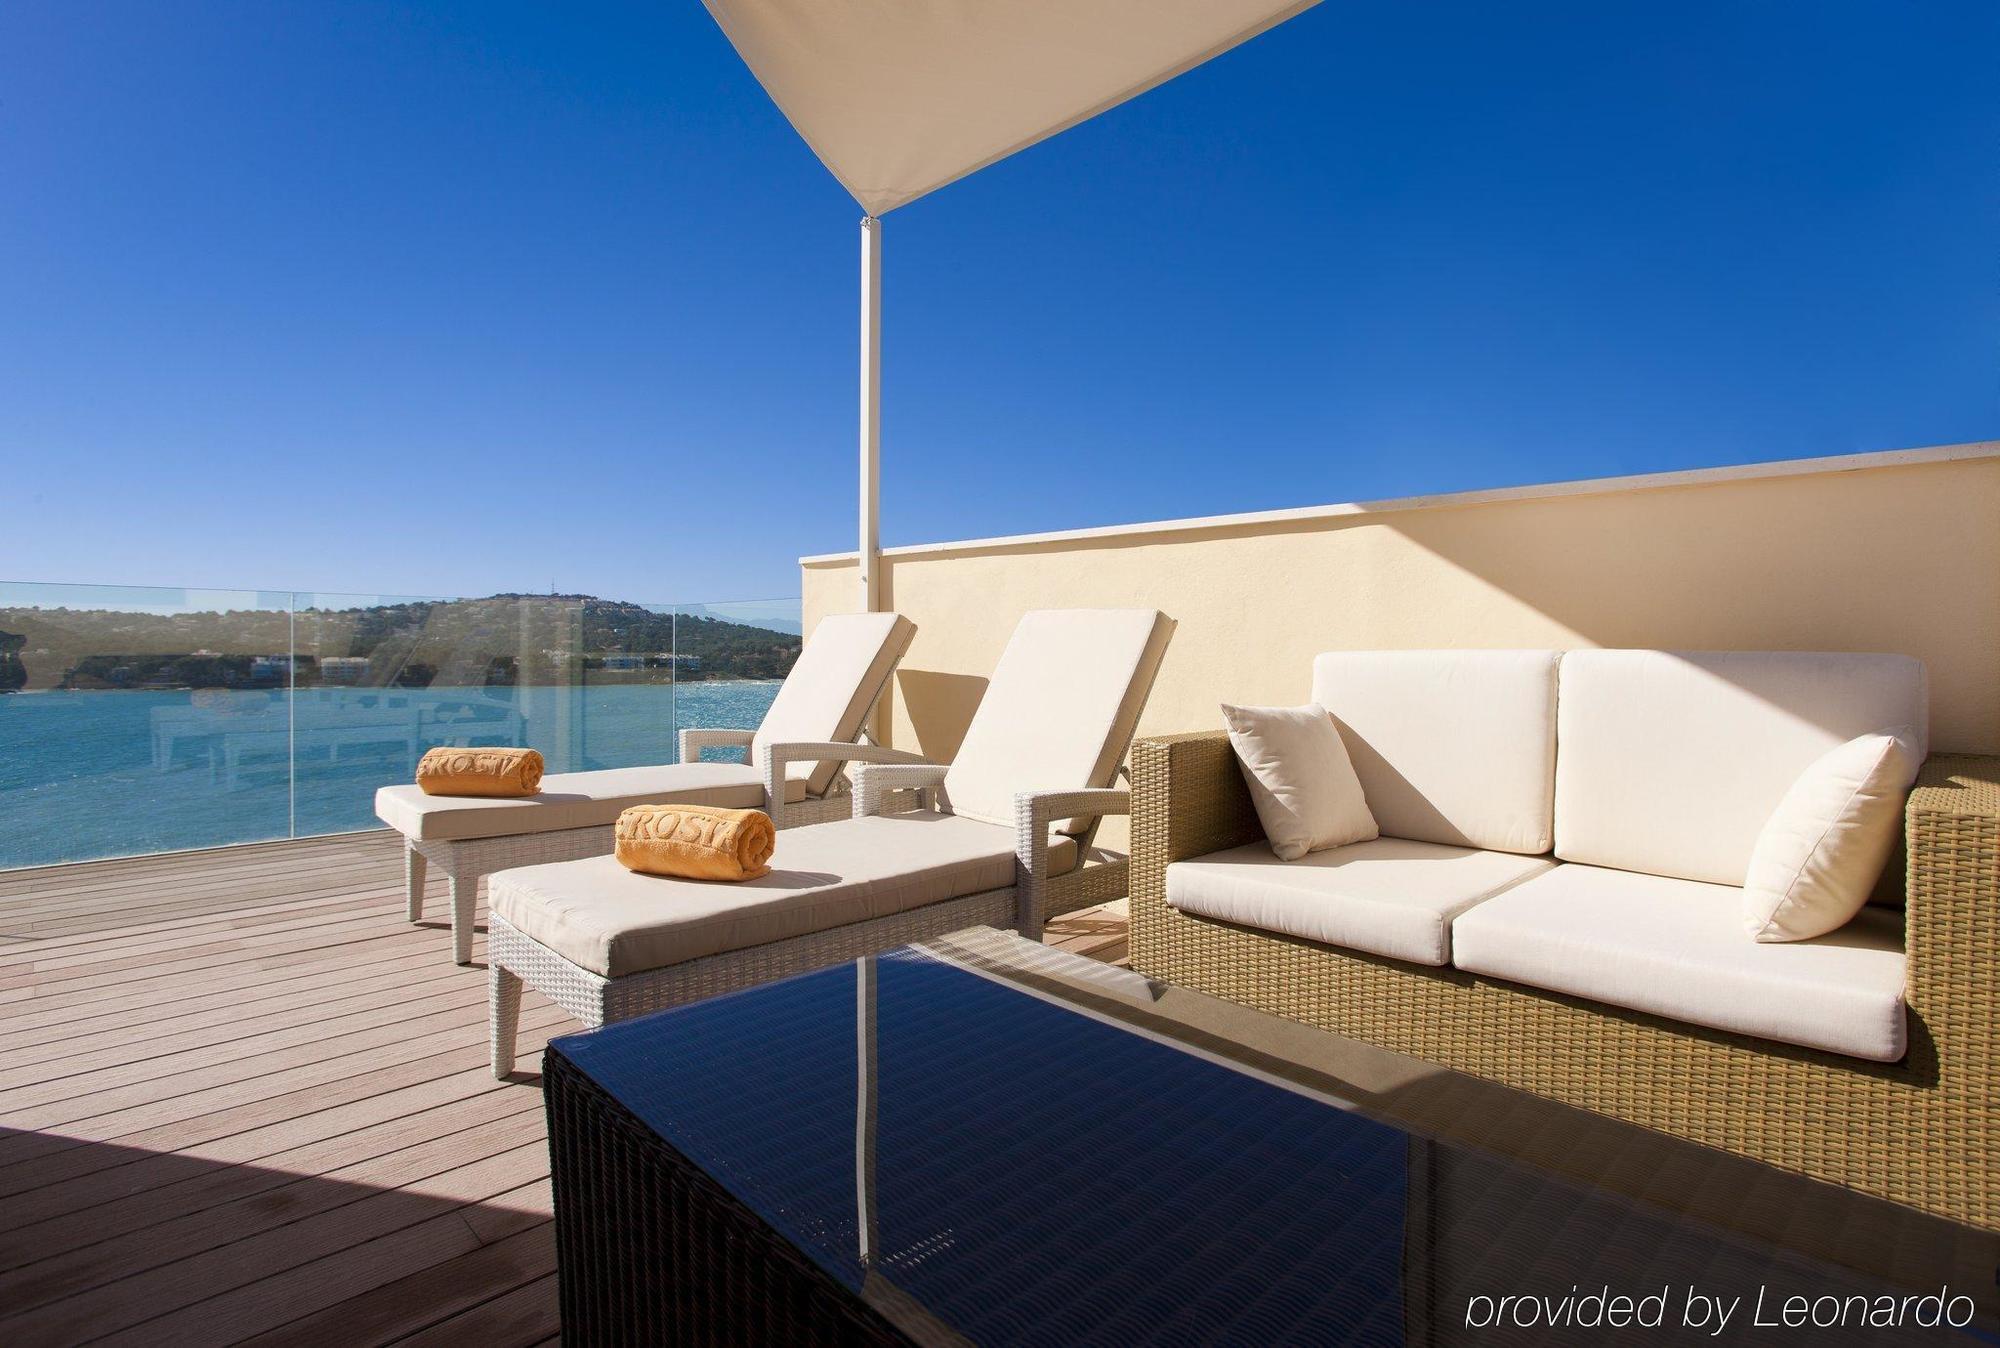 Iberostar-Suites-Hotel-Jardin-Del-Sol--Adults-Only-photos-Exterior (6).jpeg